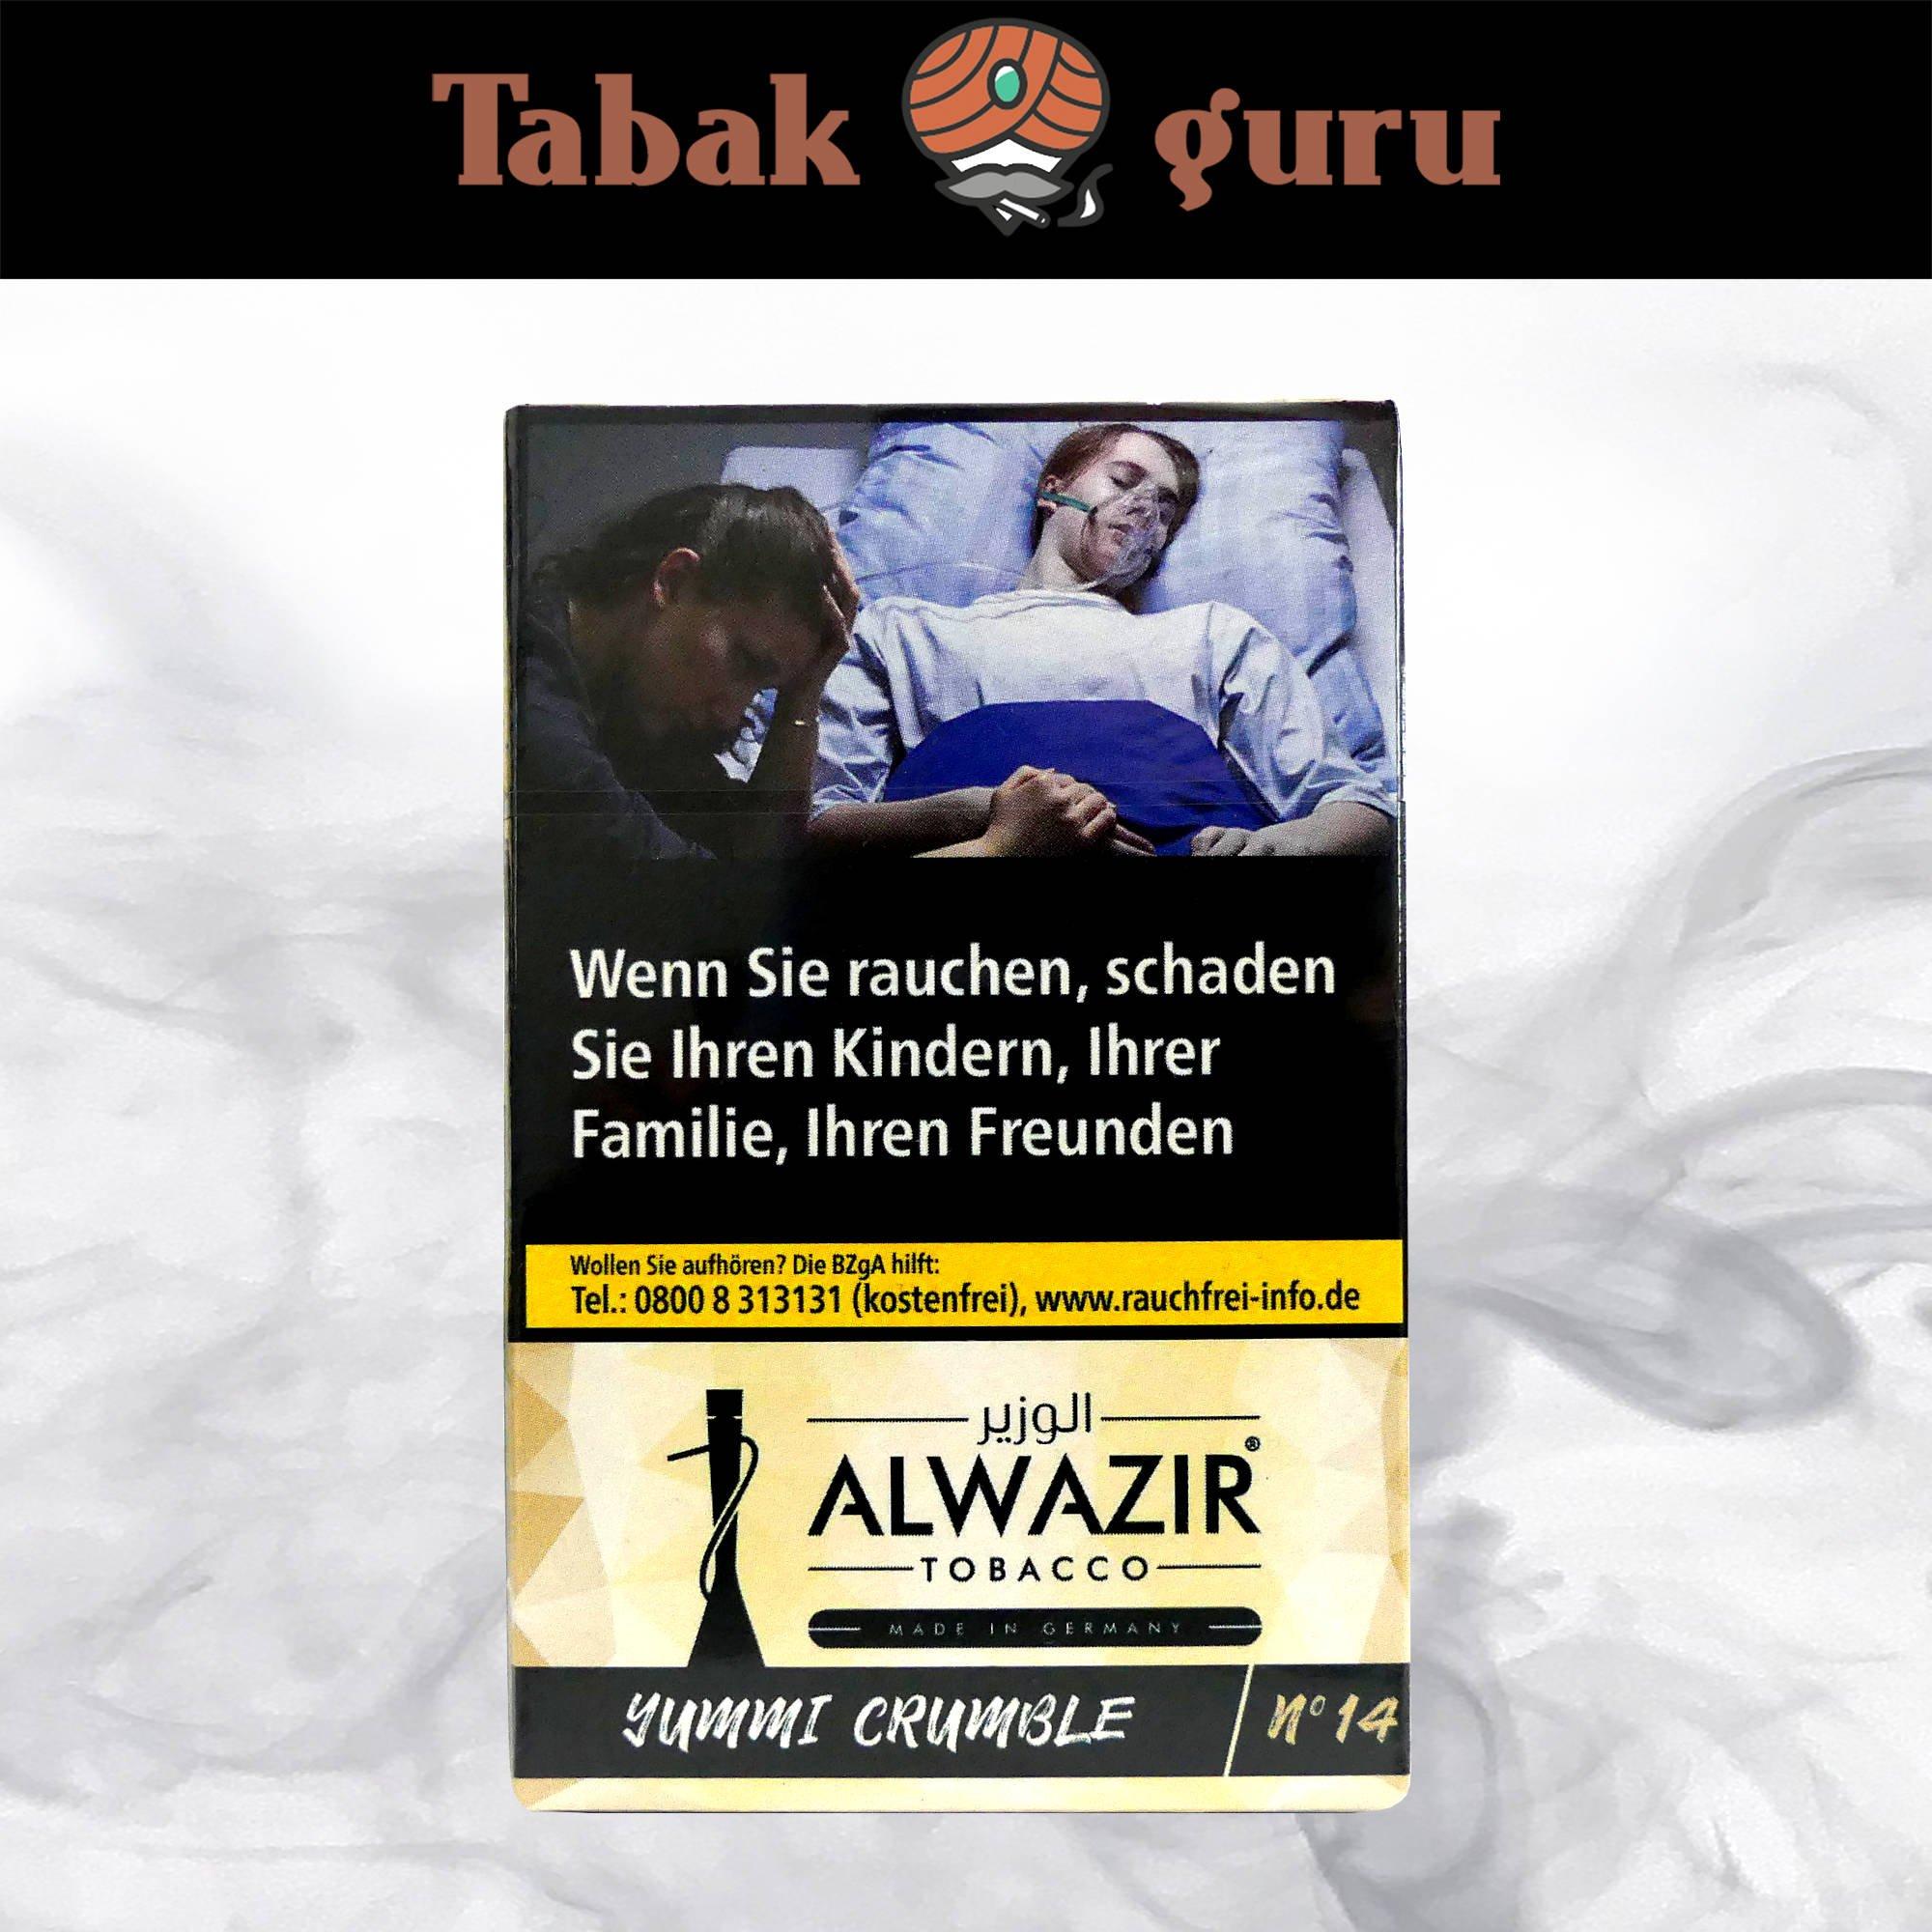 Alwazir Shisha Tabak - No. 14 - YUMMI CRUMBLE 50g